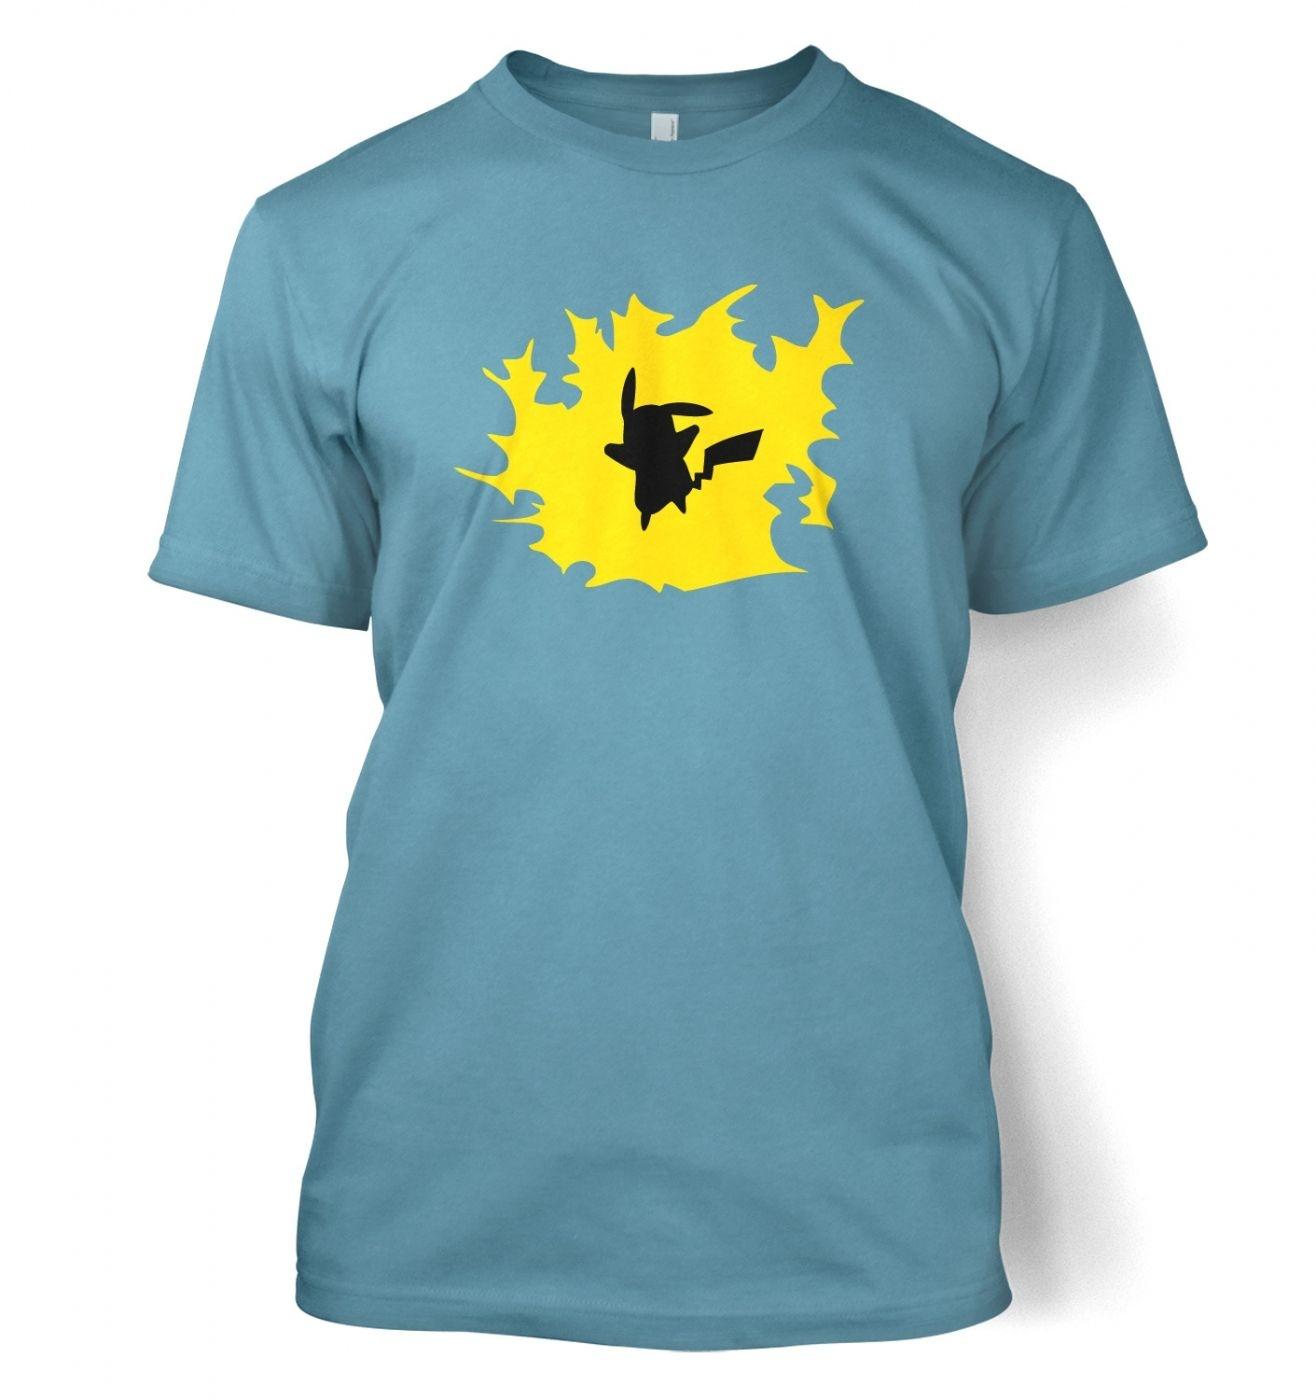 Yellow Pikachu Silhouette T-Shirt - Inspired by Pokemon